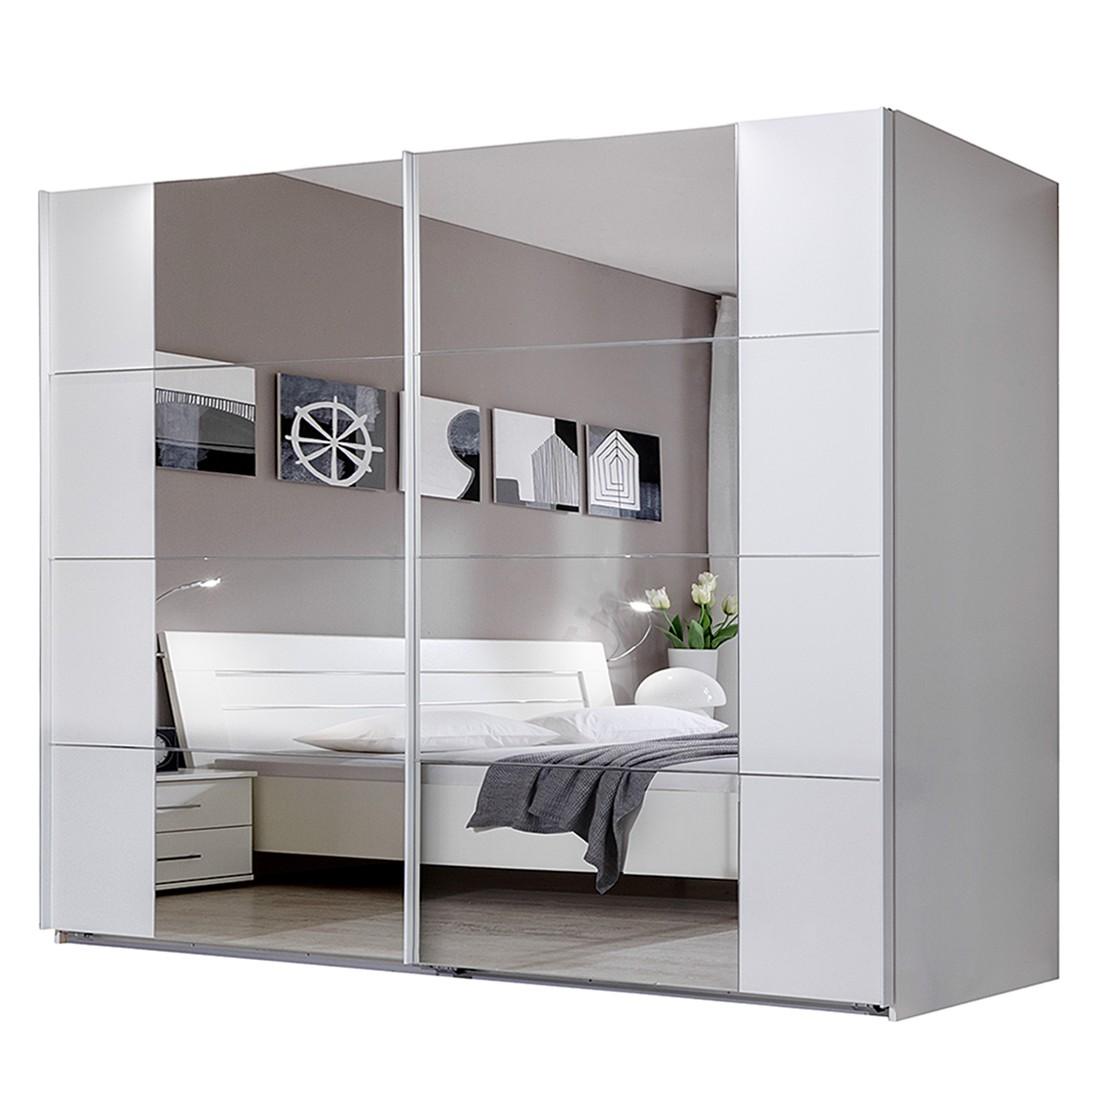 schwebet renschrank dillon alpinwei chrom. Black Bedroom Furniture Sets. Home Design Ideas